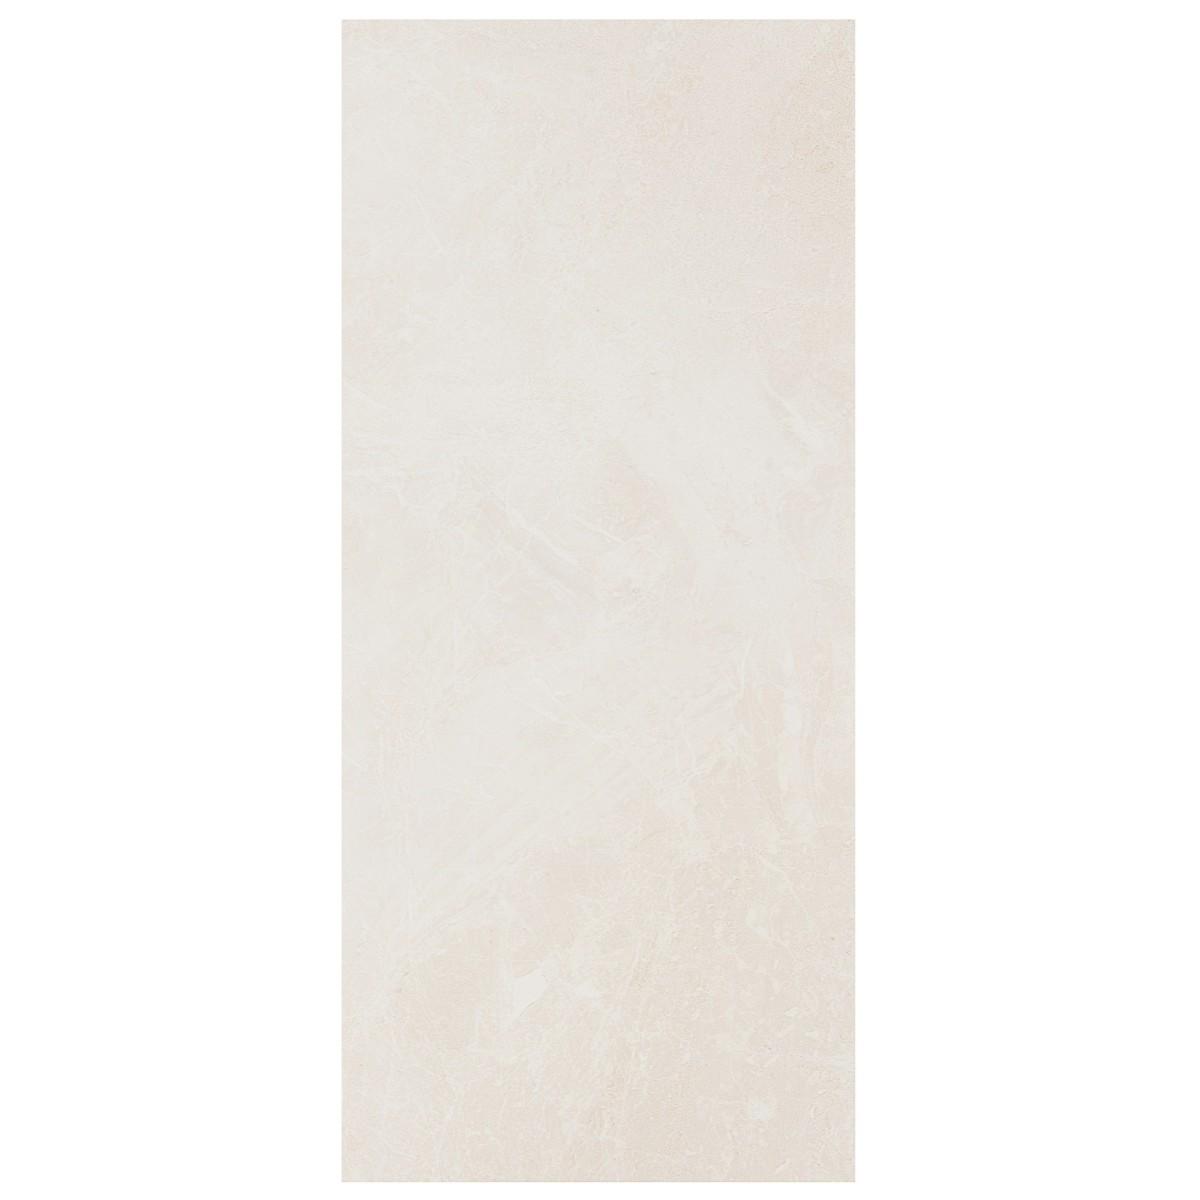 Плитка настенная Afina 20х44 см 1.05 м2 цвет серый